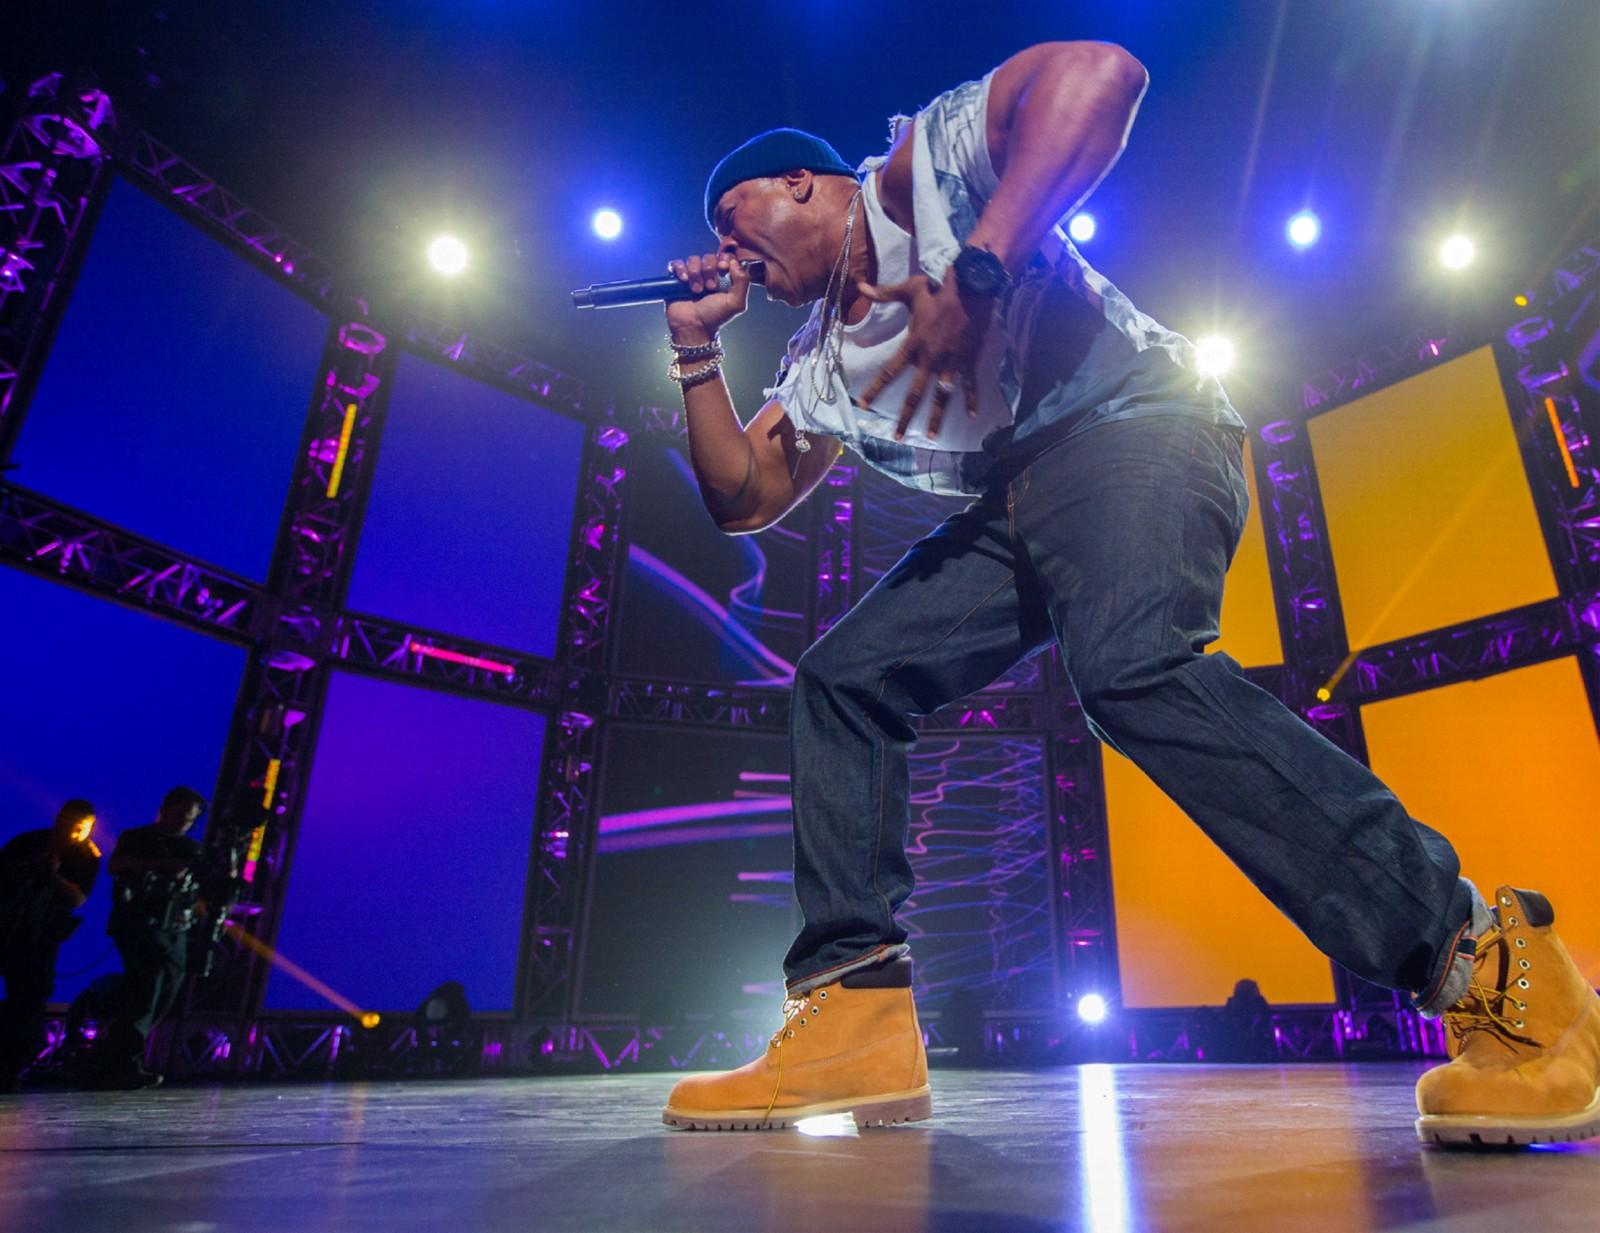 LL Cool J 's BIG announcement!